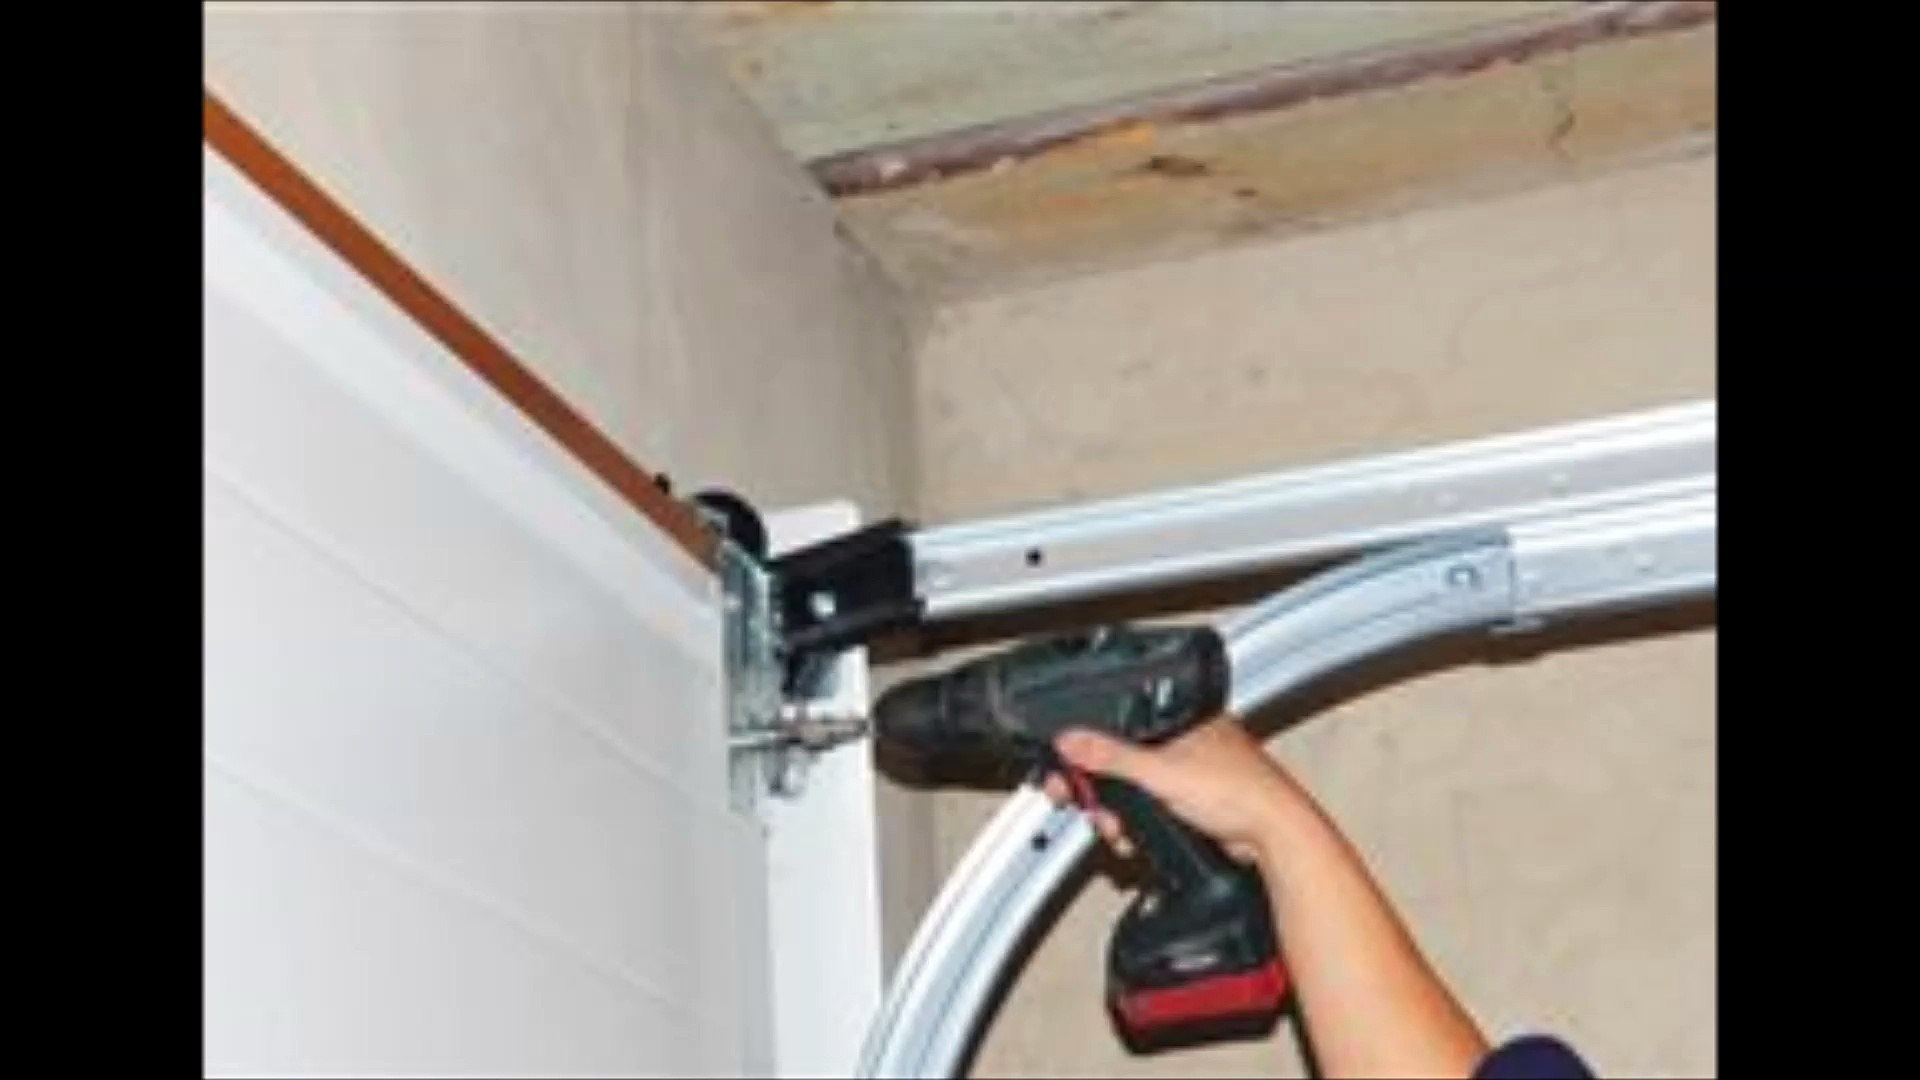 Advanced Garage Door Works St. George-(435) 216-0912